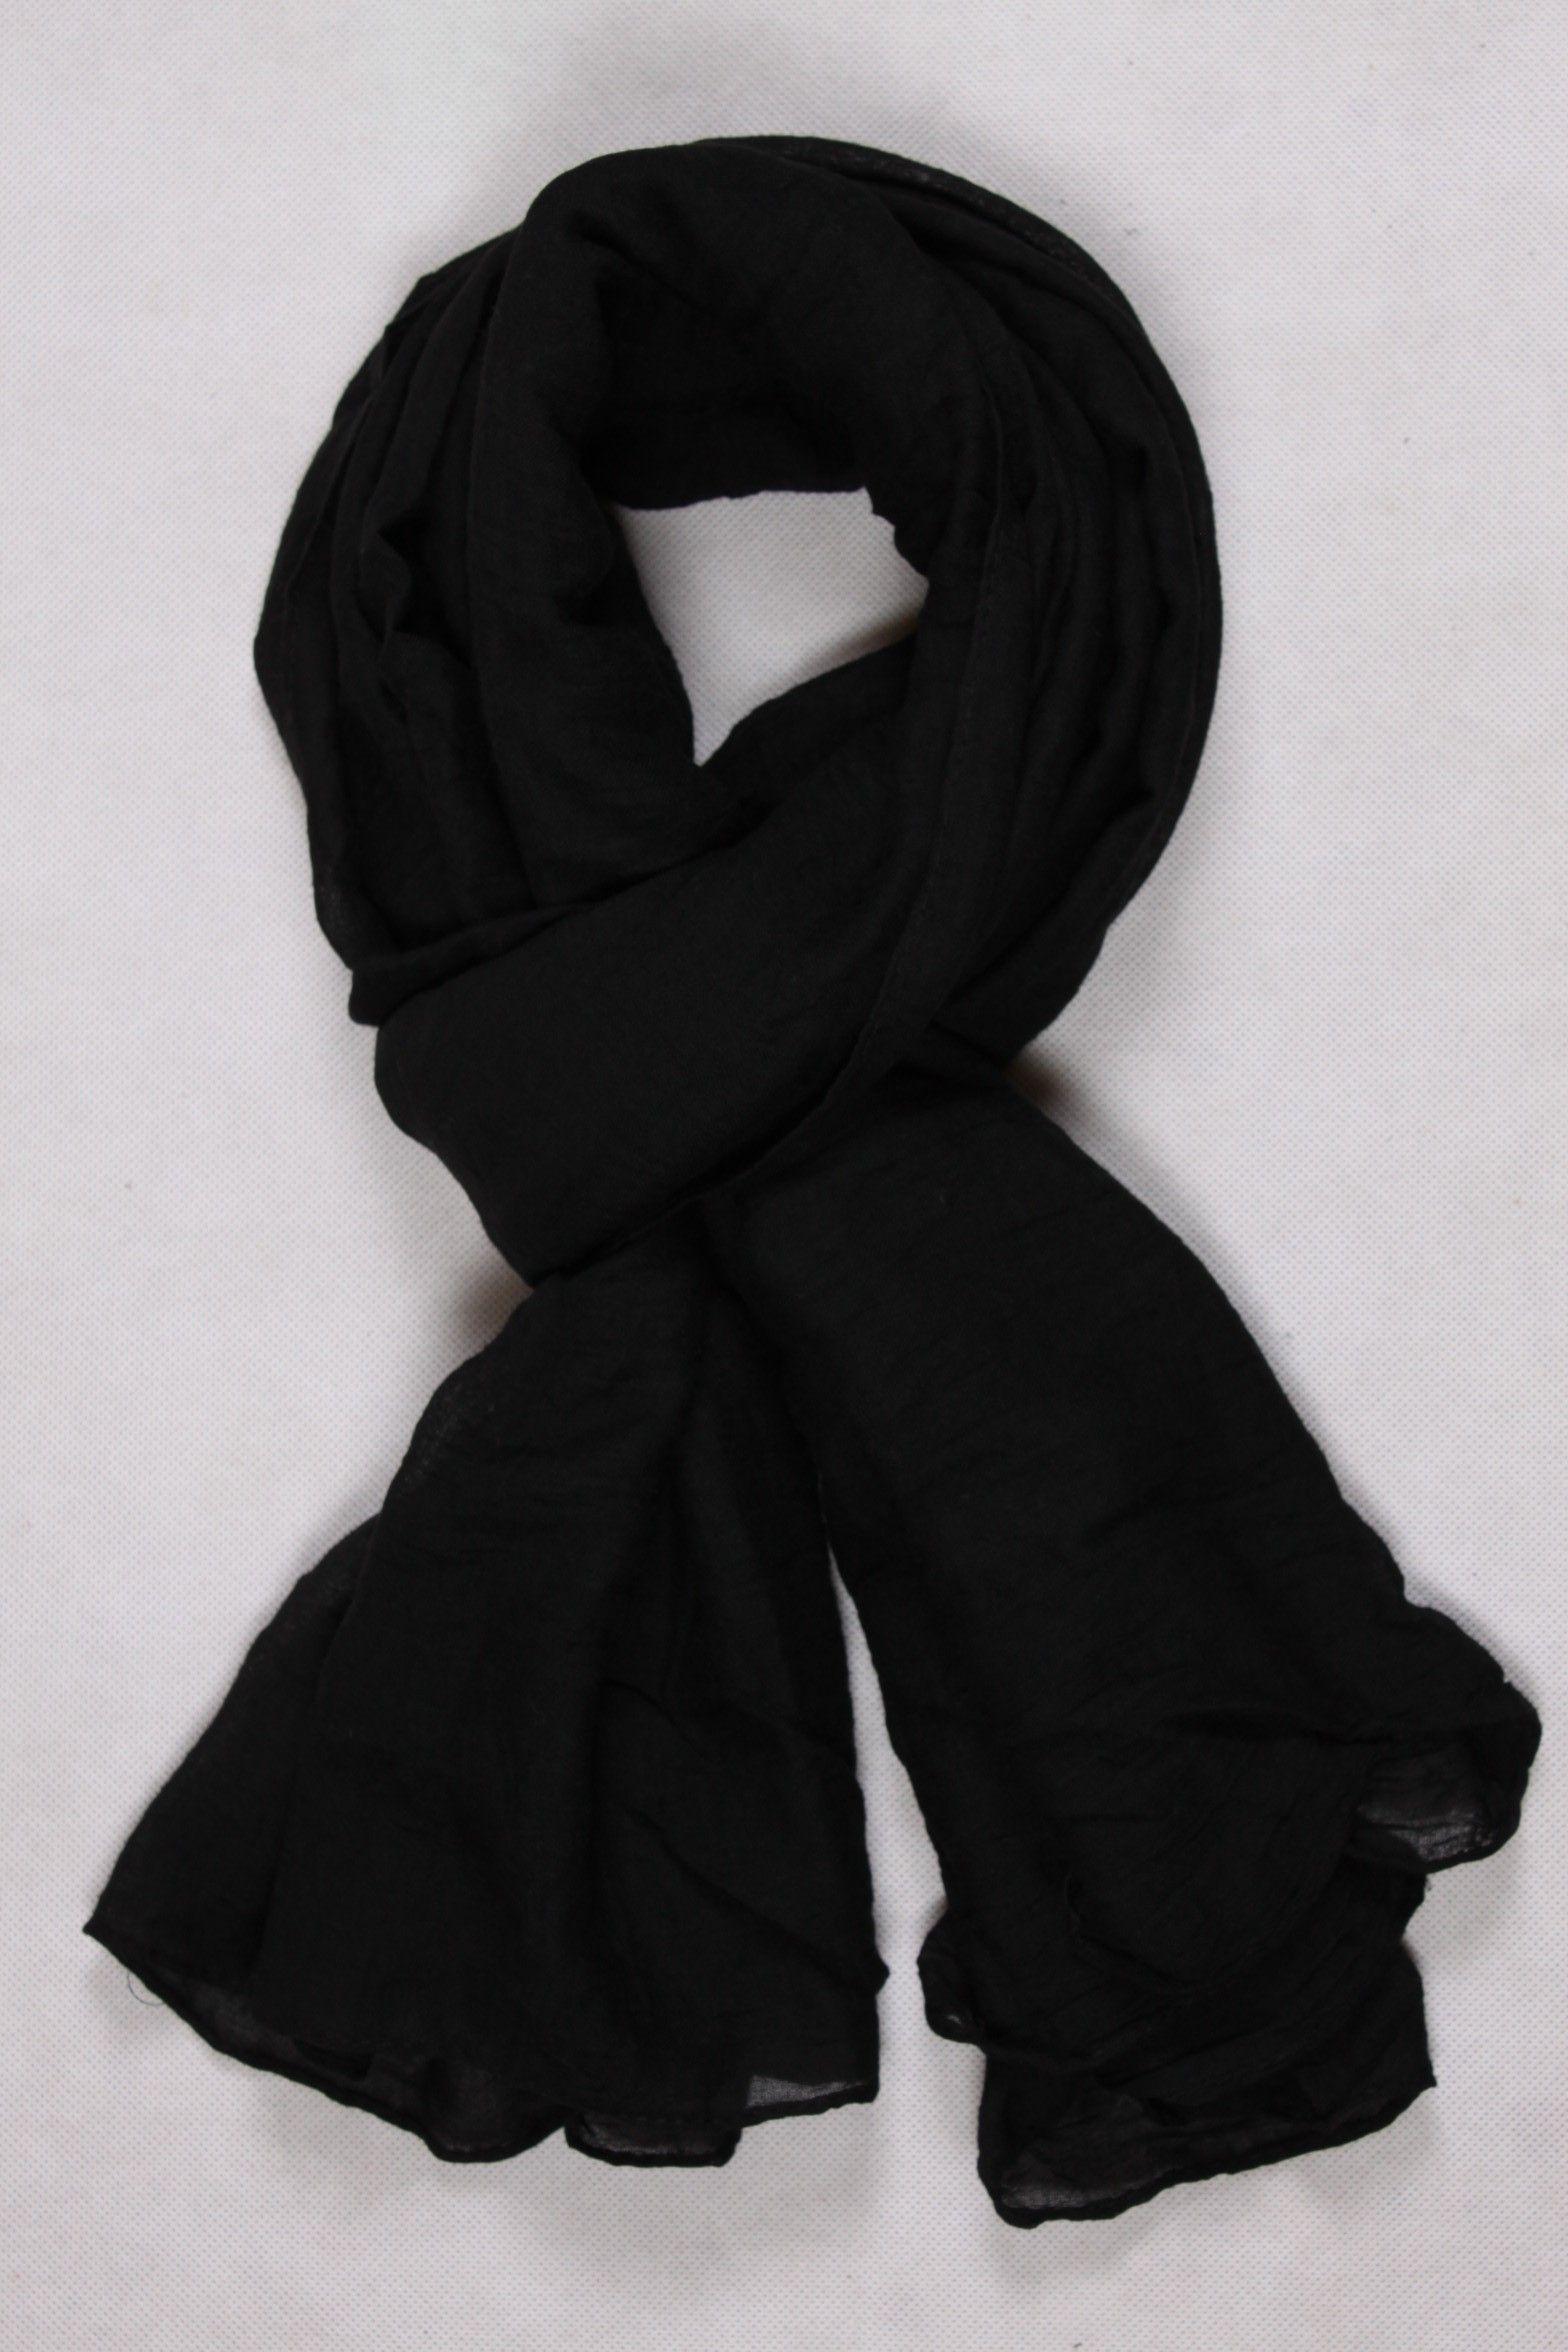 Chèche uni noir   Chèche Femme   Pinterest   Noir, Femme et Cheche femme cdd690d2353